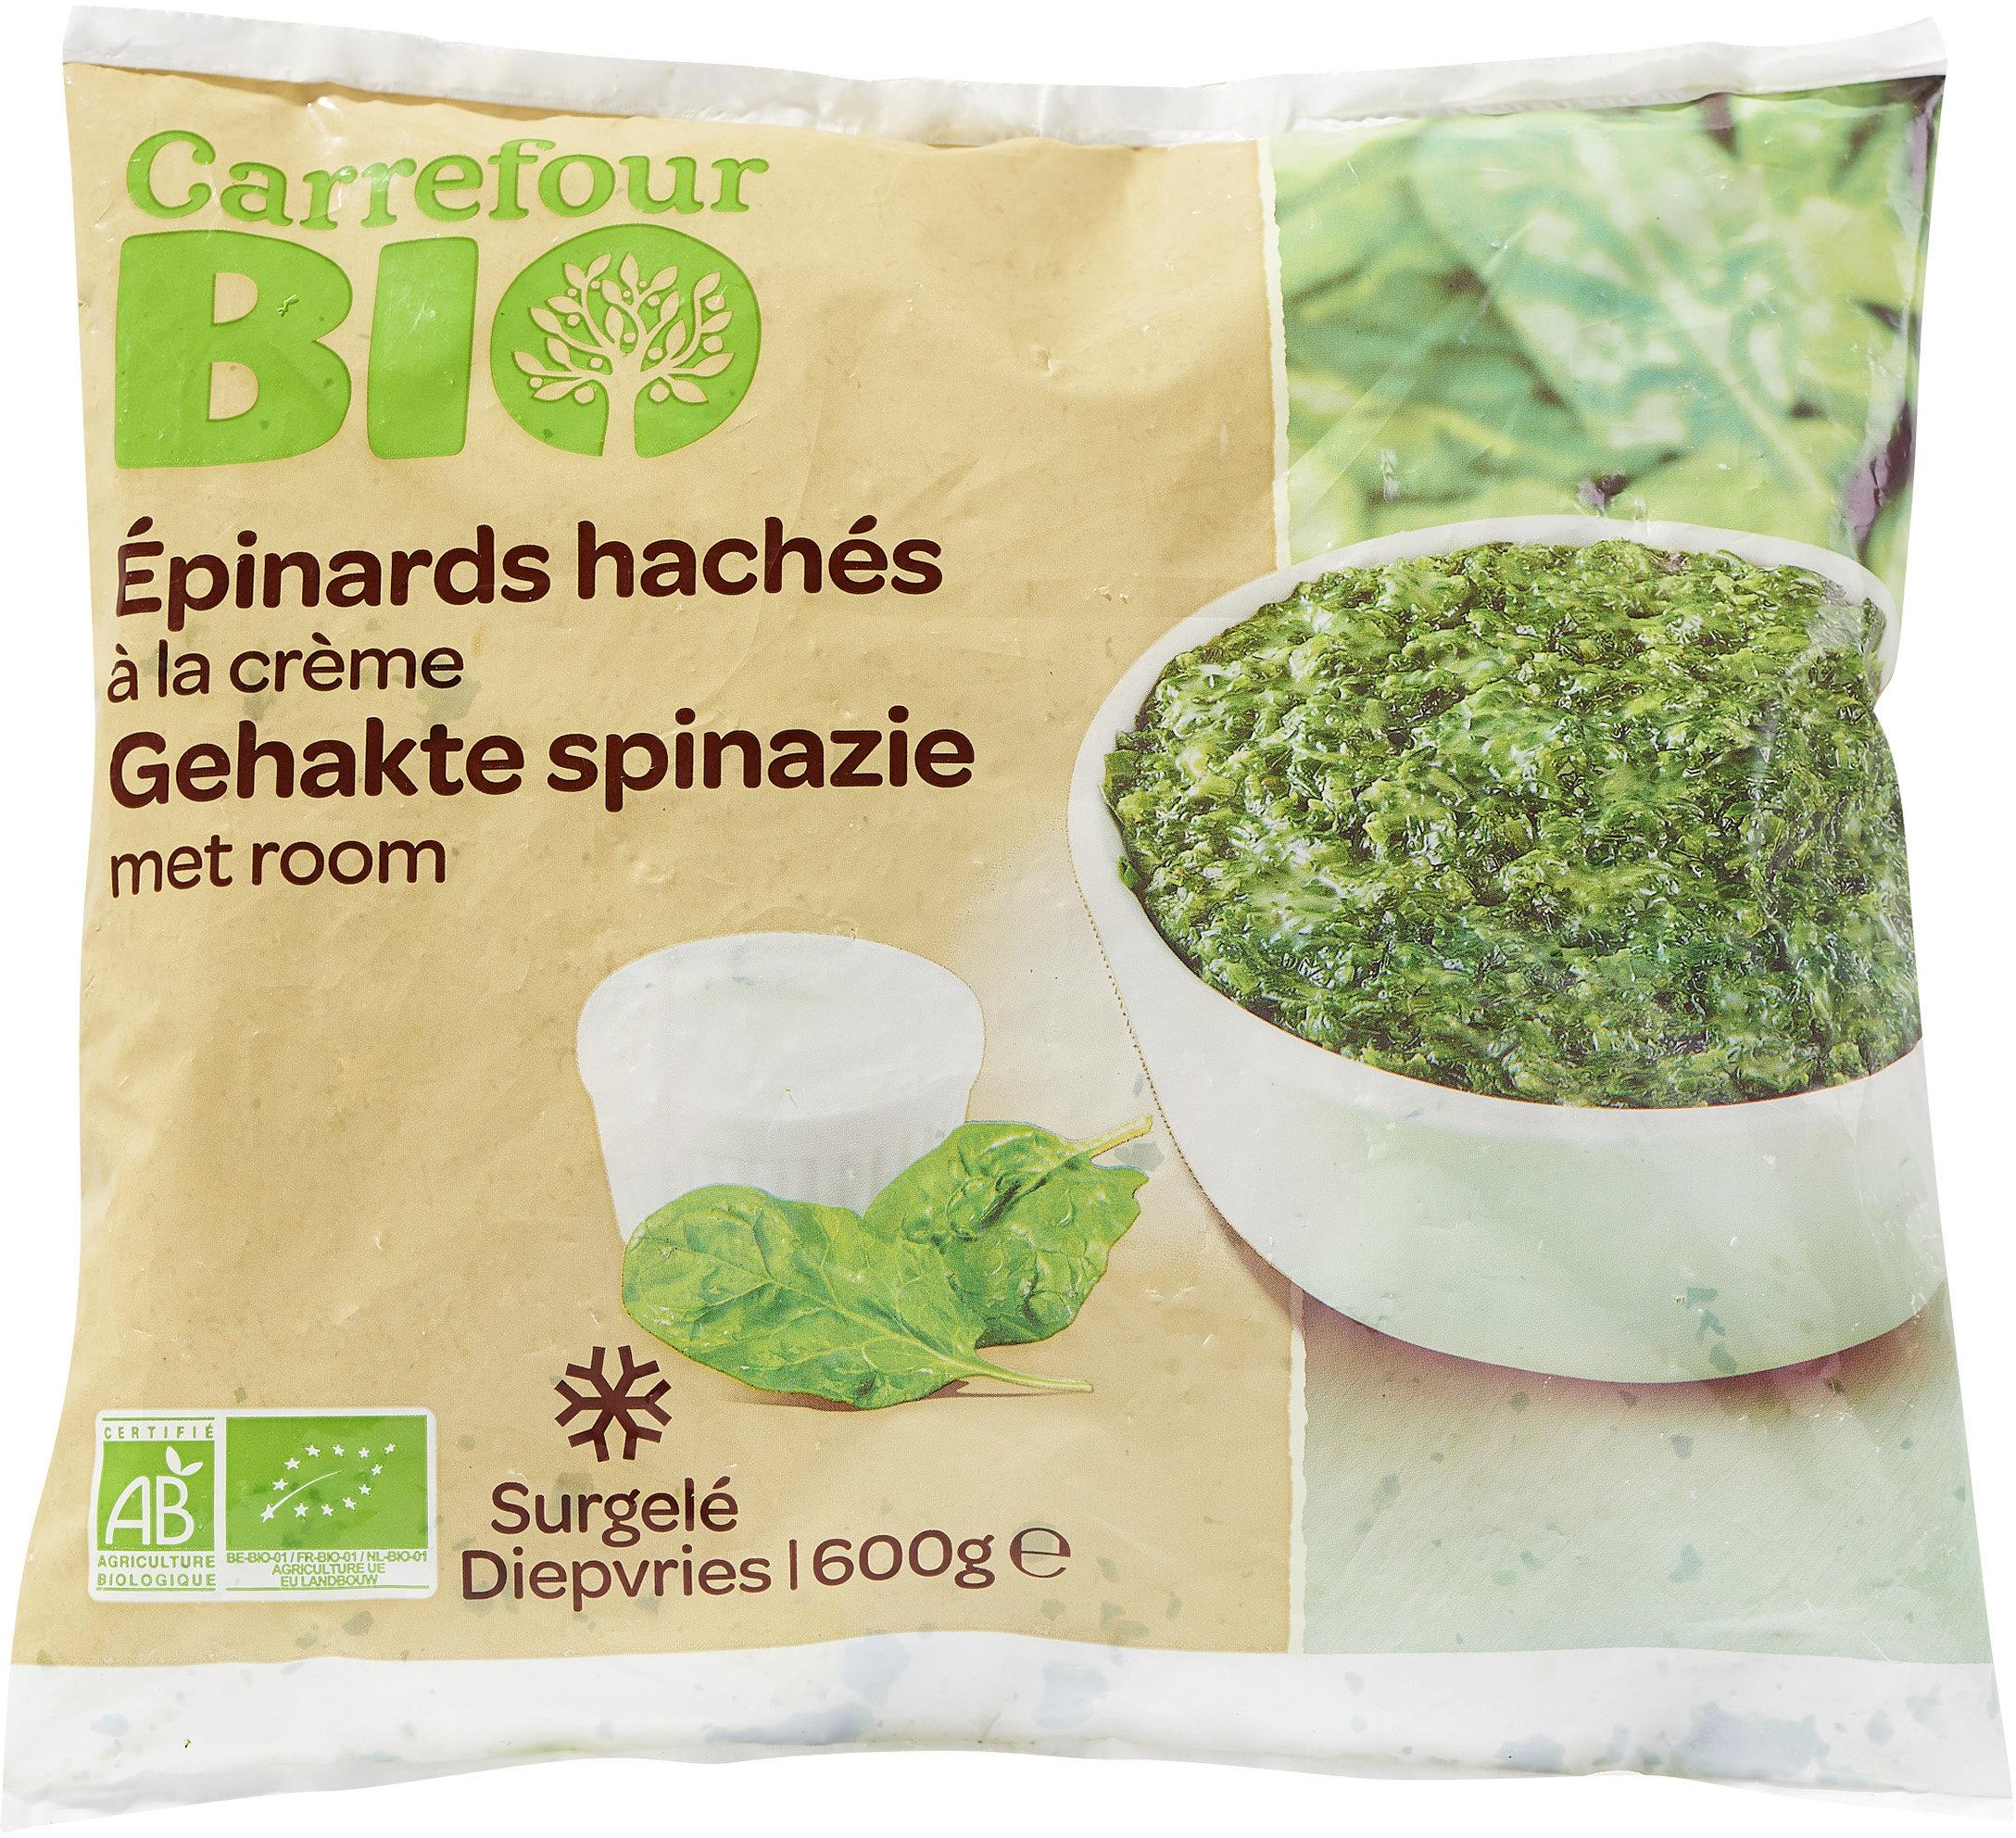 Épinards hachés - Product